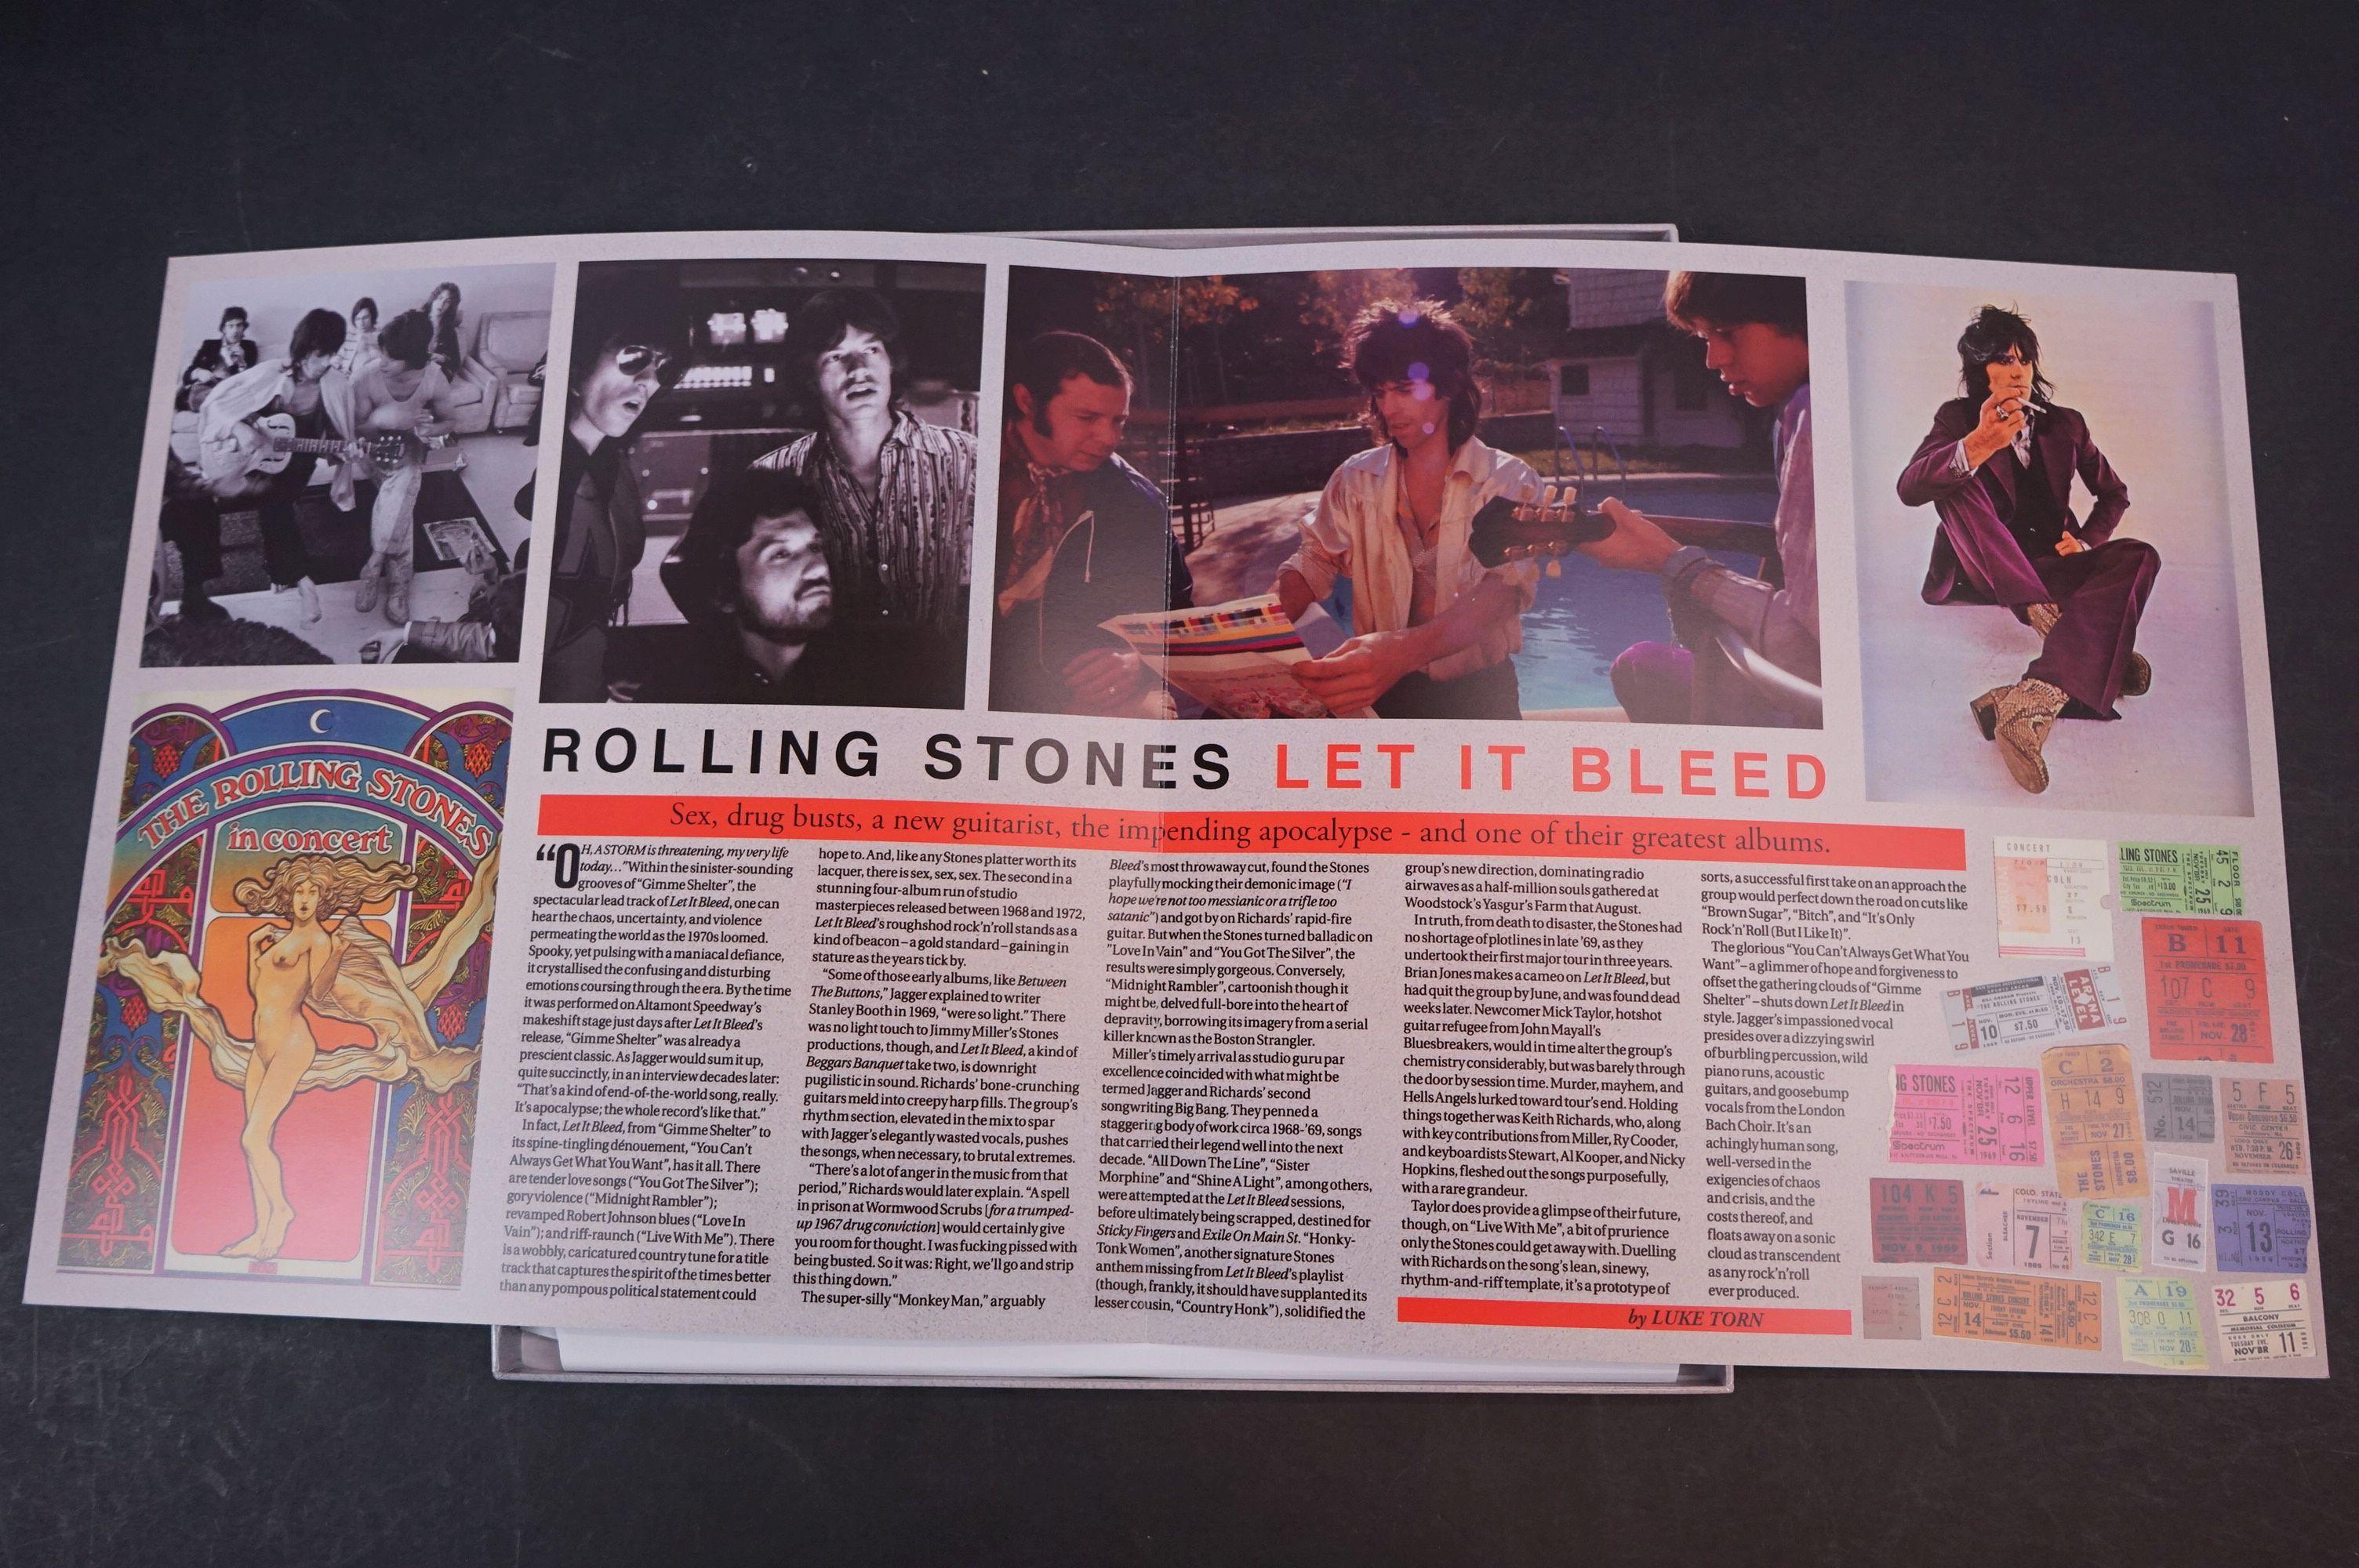 Vinyl - ltd edn The Real Alternate Album Rolling Stones Let It Bleed 3 LP / 2 CD Box Set RTR011, - Image 4 of 9